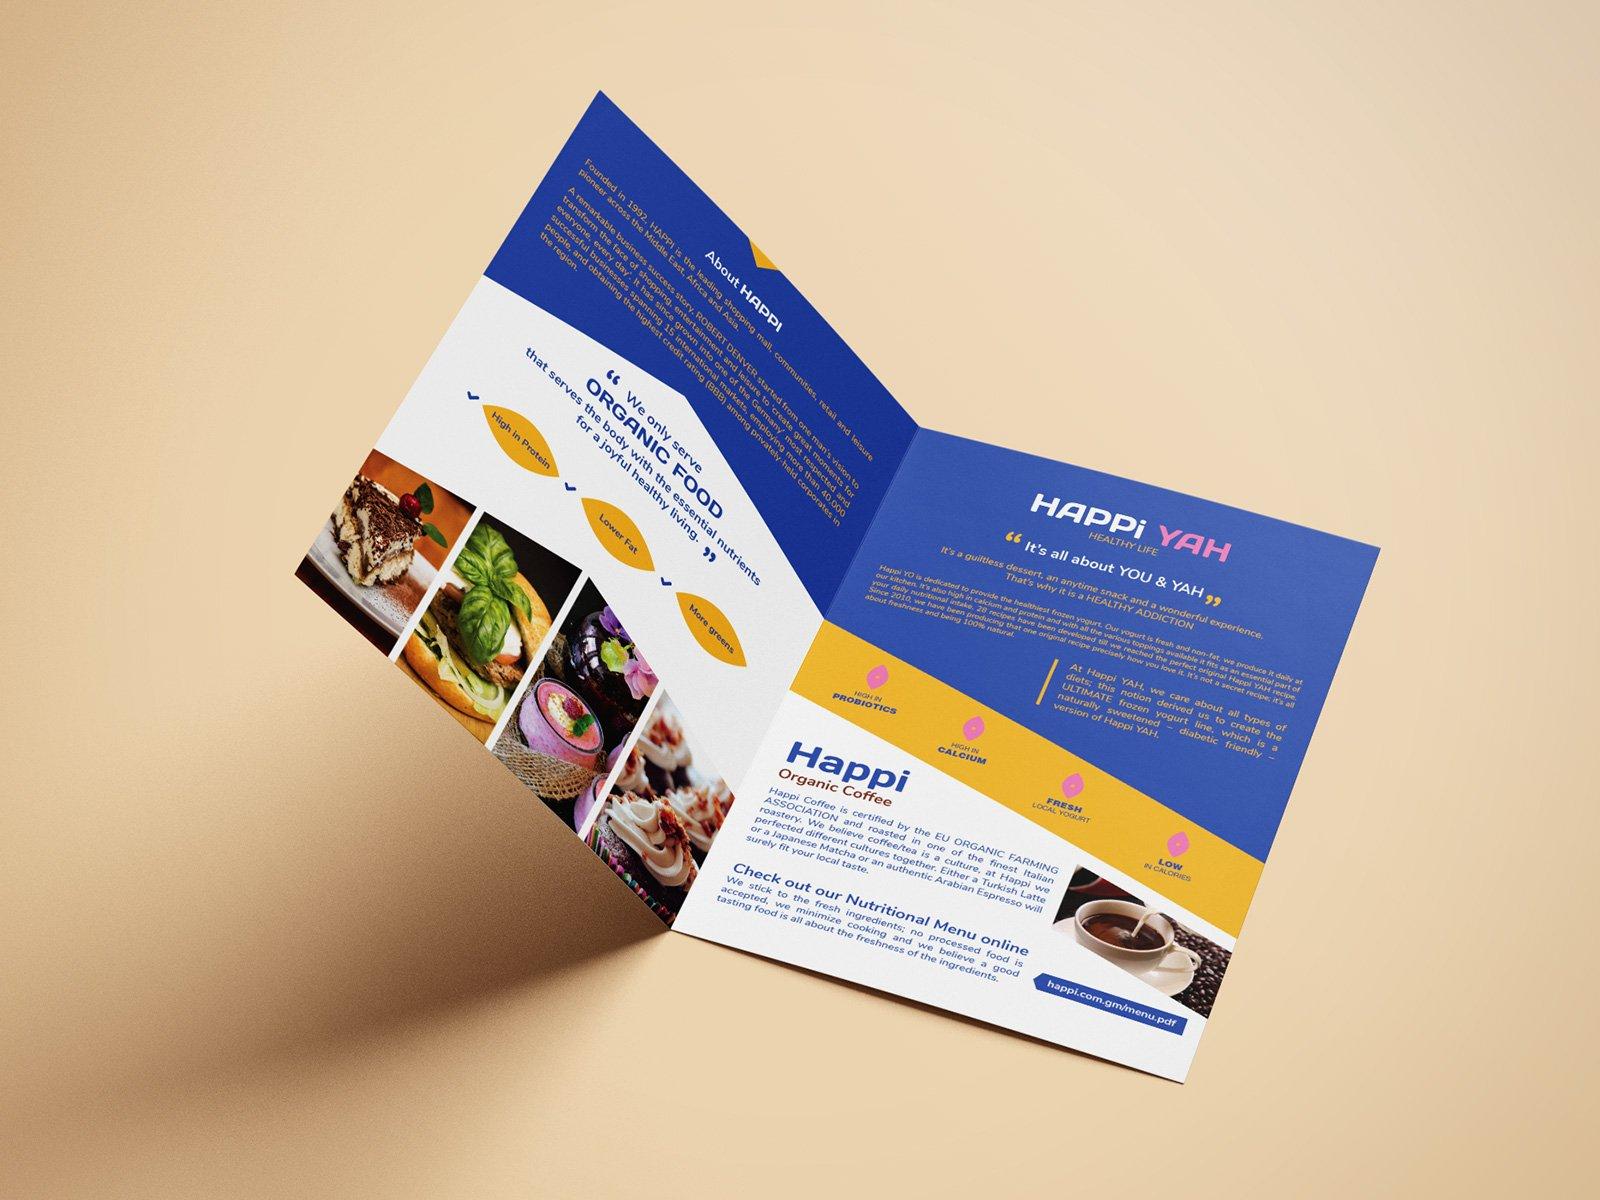 Free-Food-Company-Brochure-Design-Template-04